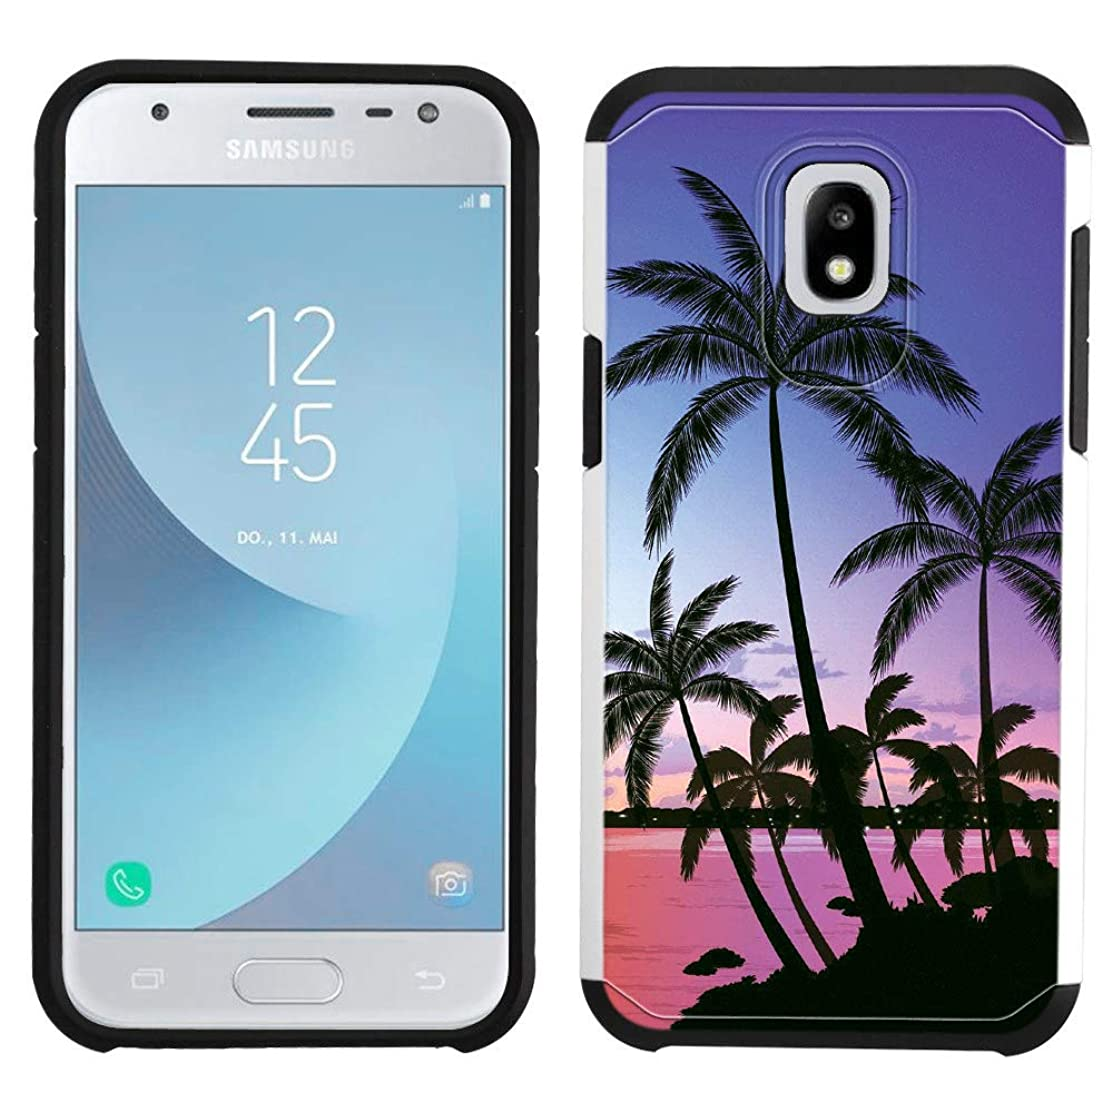 Galaxy J7 2018 Case [Sunset Sea](Silver) PaletteShield Hybrid Armor Skin Phone Cover (fit Samsung Galaxy J7 2018/ J7v/ Star/Refine)